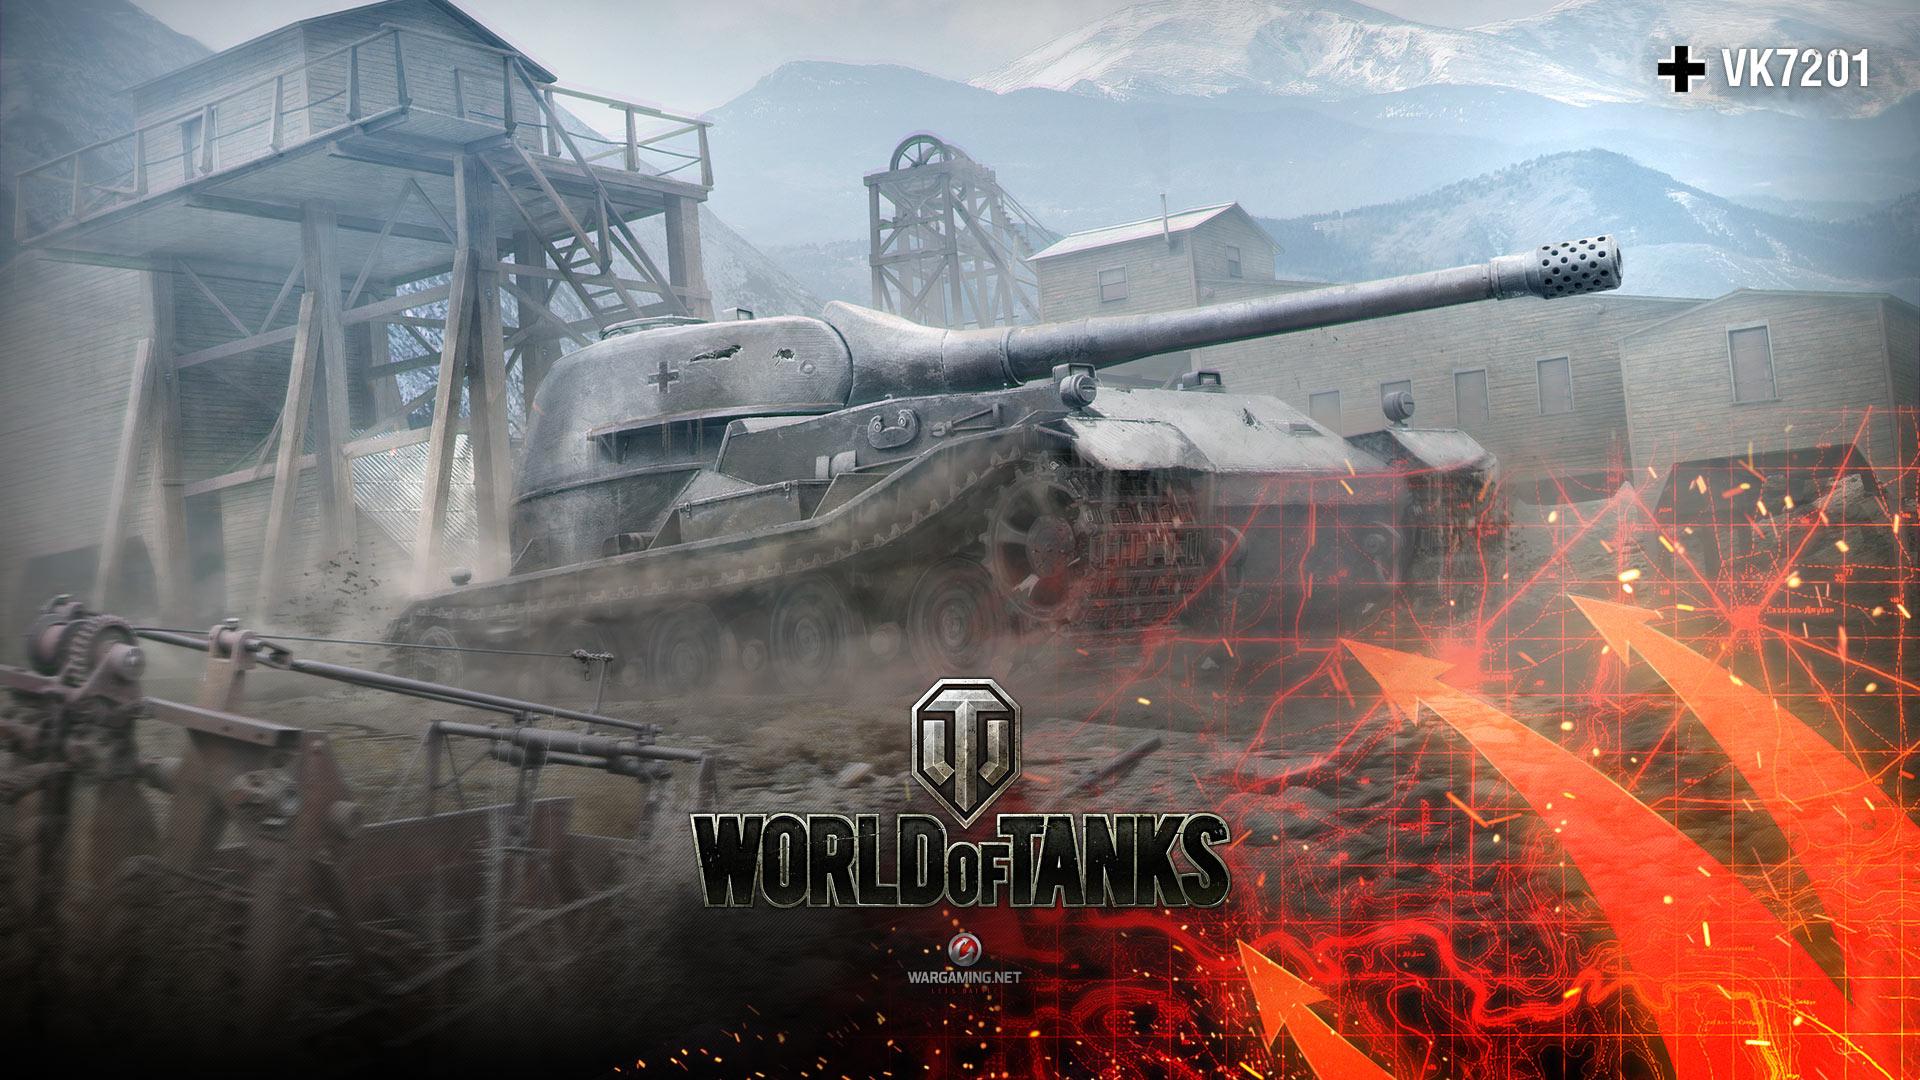 vk7201_gm_1920x1080_arrows.jpg - World of Tanks